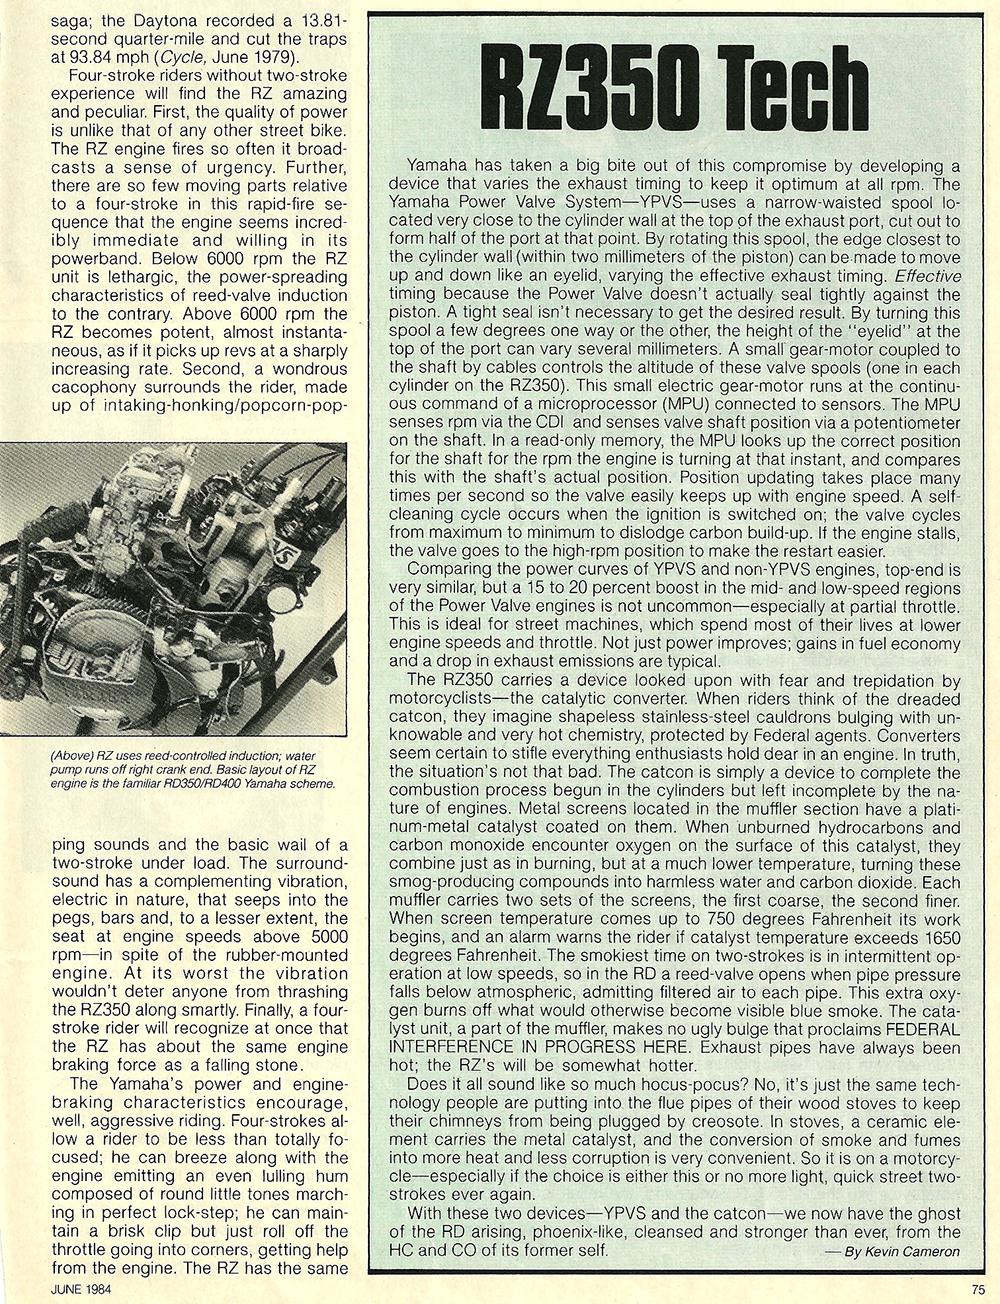 1984 Yamaha RZ350L road test 06.jpg